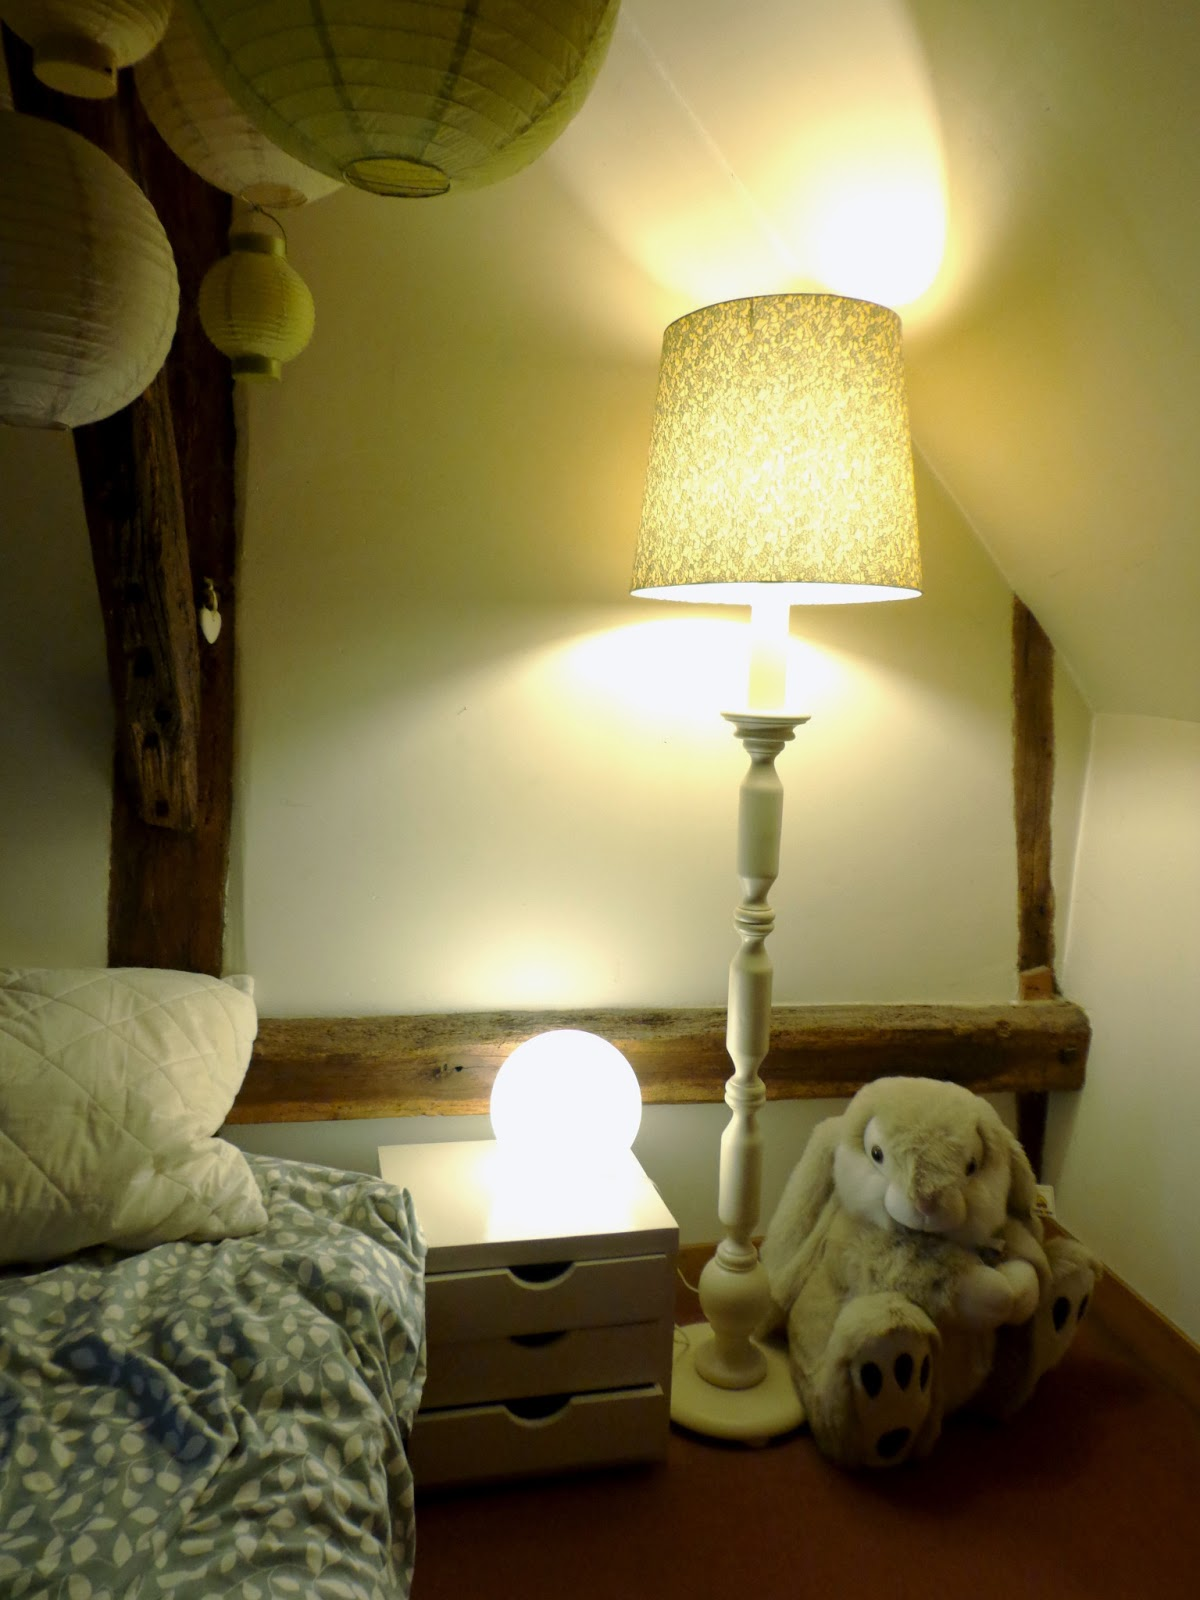 la fibre cr ative f vrier 2013. Black Bedroom Furniture Sets. Home Design Ideas